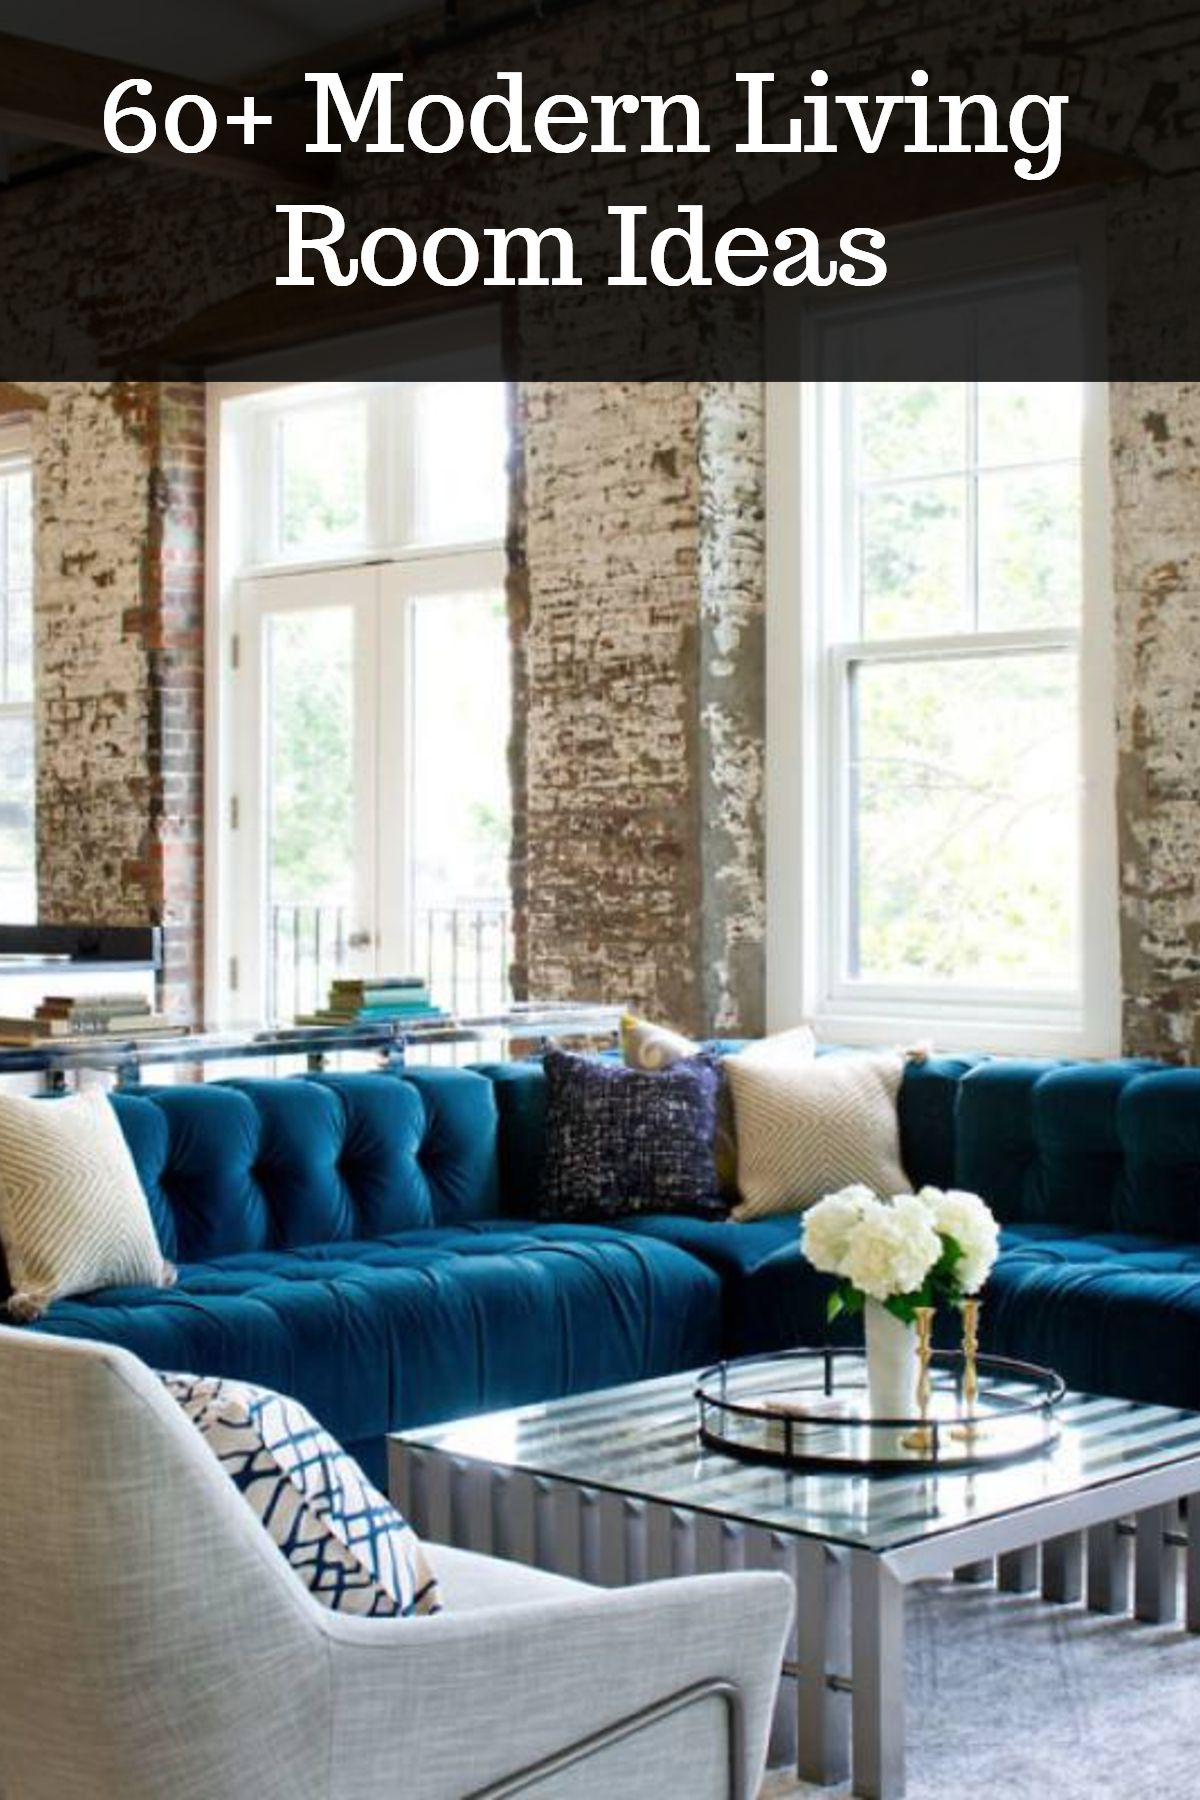 51 Modern Minimalist Decor Ideas Living Room Mo